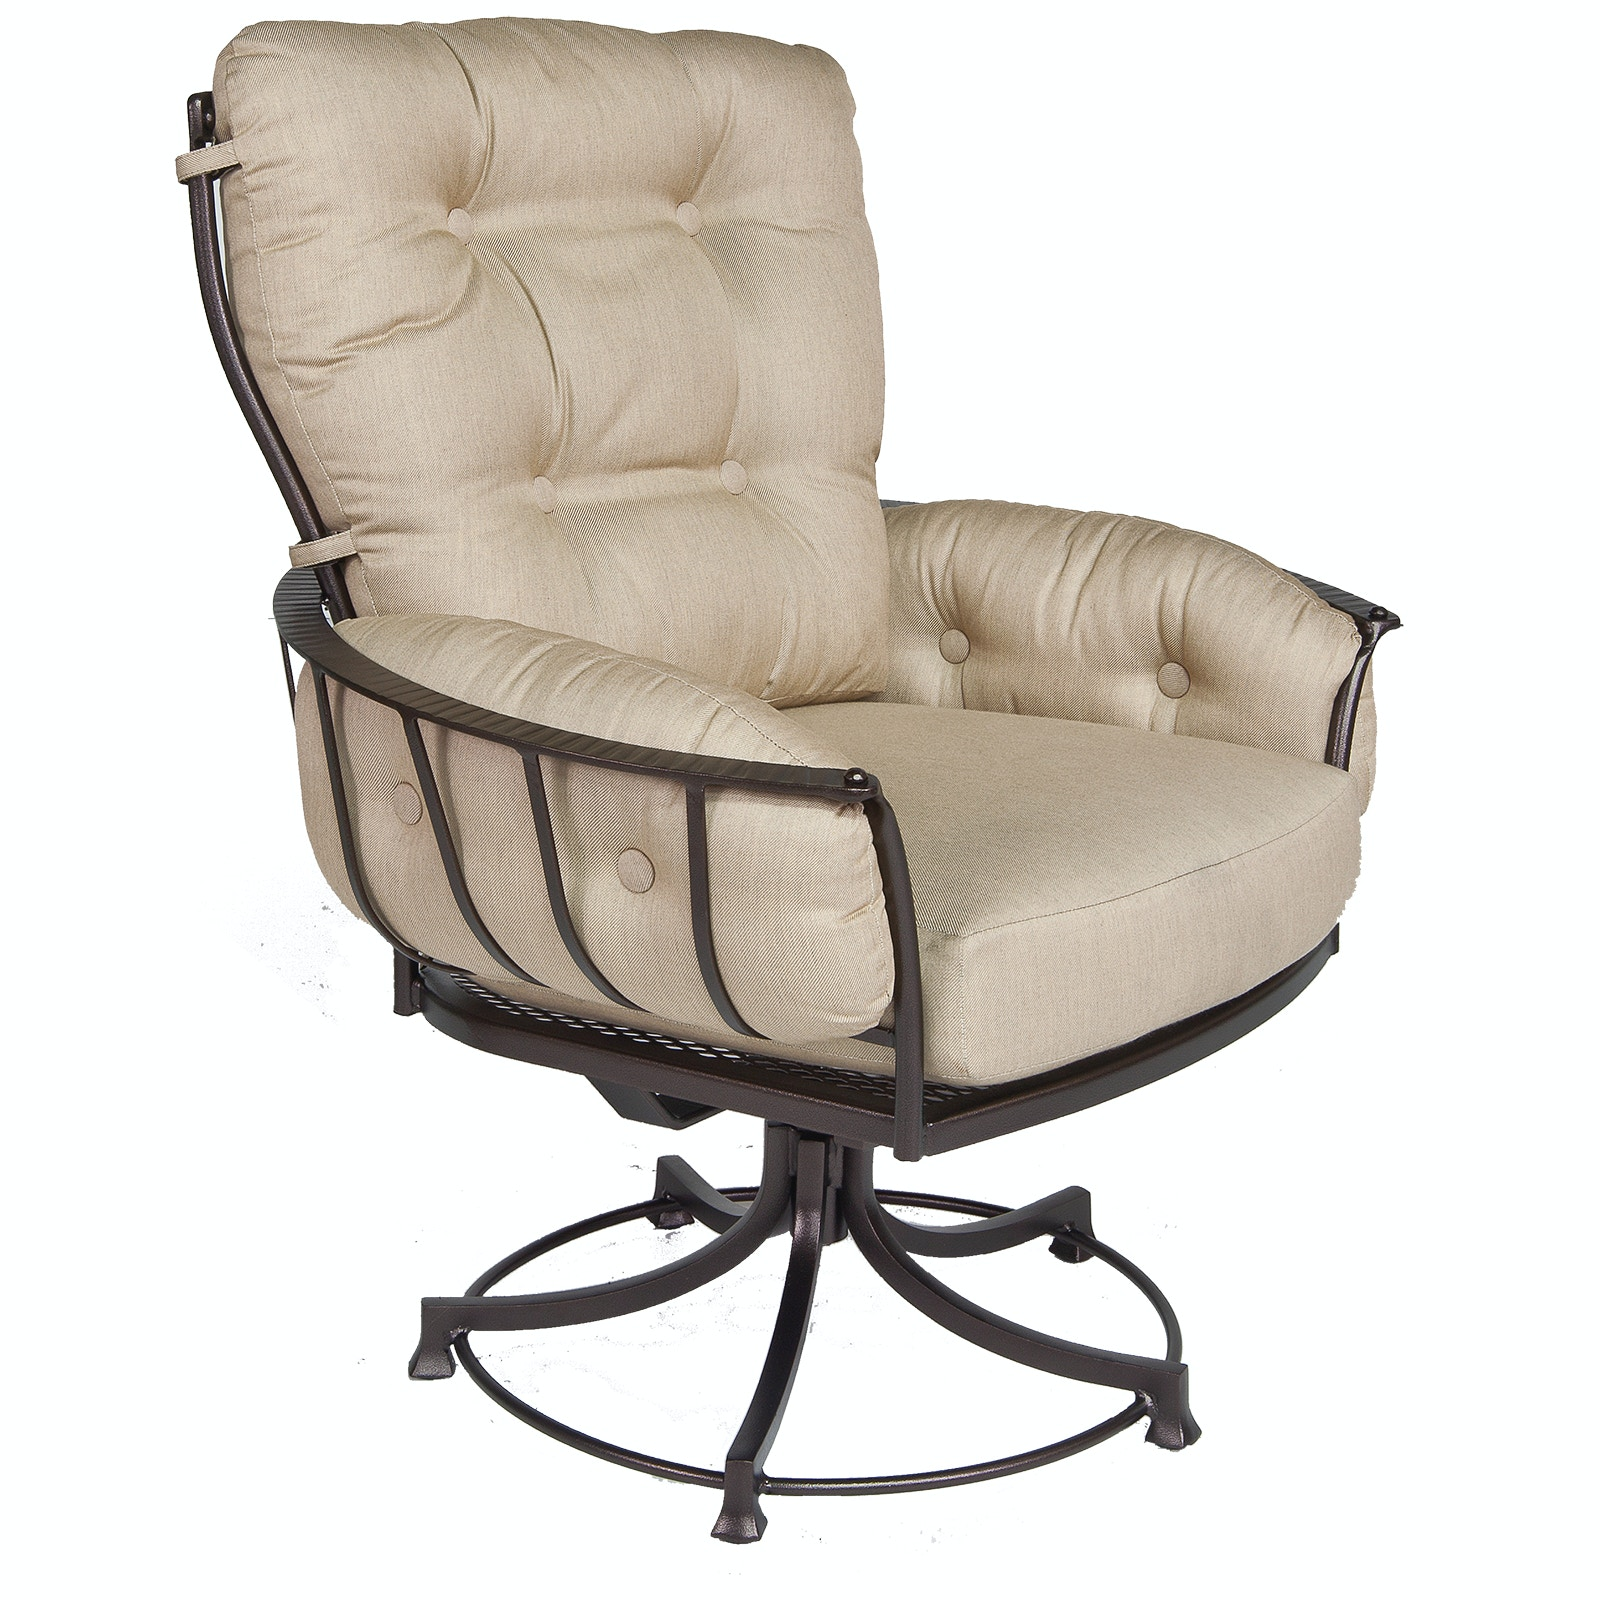 Merveilleux OW Lee Furniture Monterra Mini Swivel Rocker Lounge Chair Owlee Furniture  424 SR